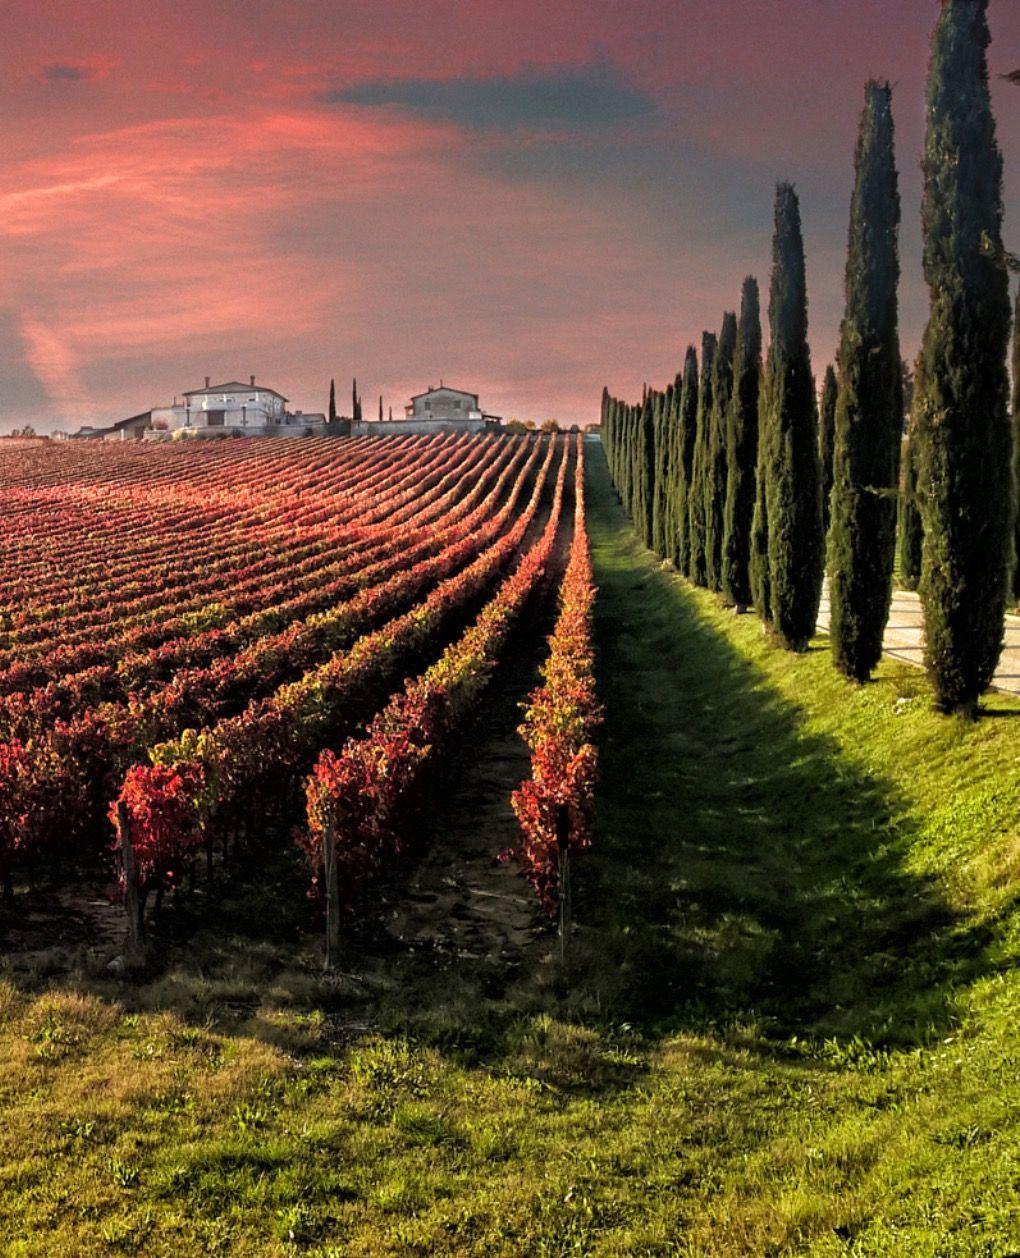 Vineyard by Giuseppe  Peppoloni (Italy)